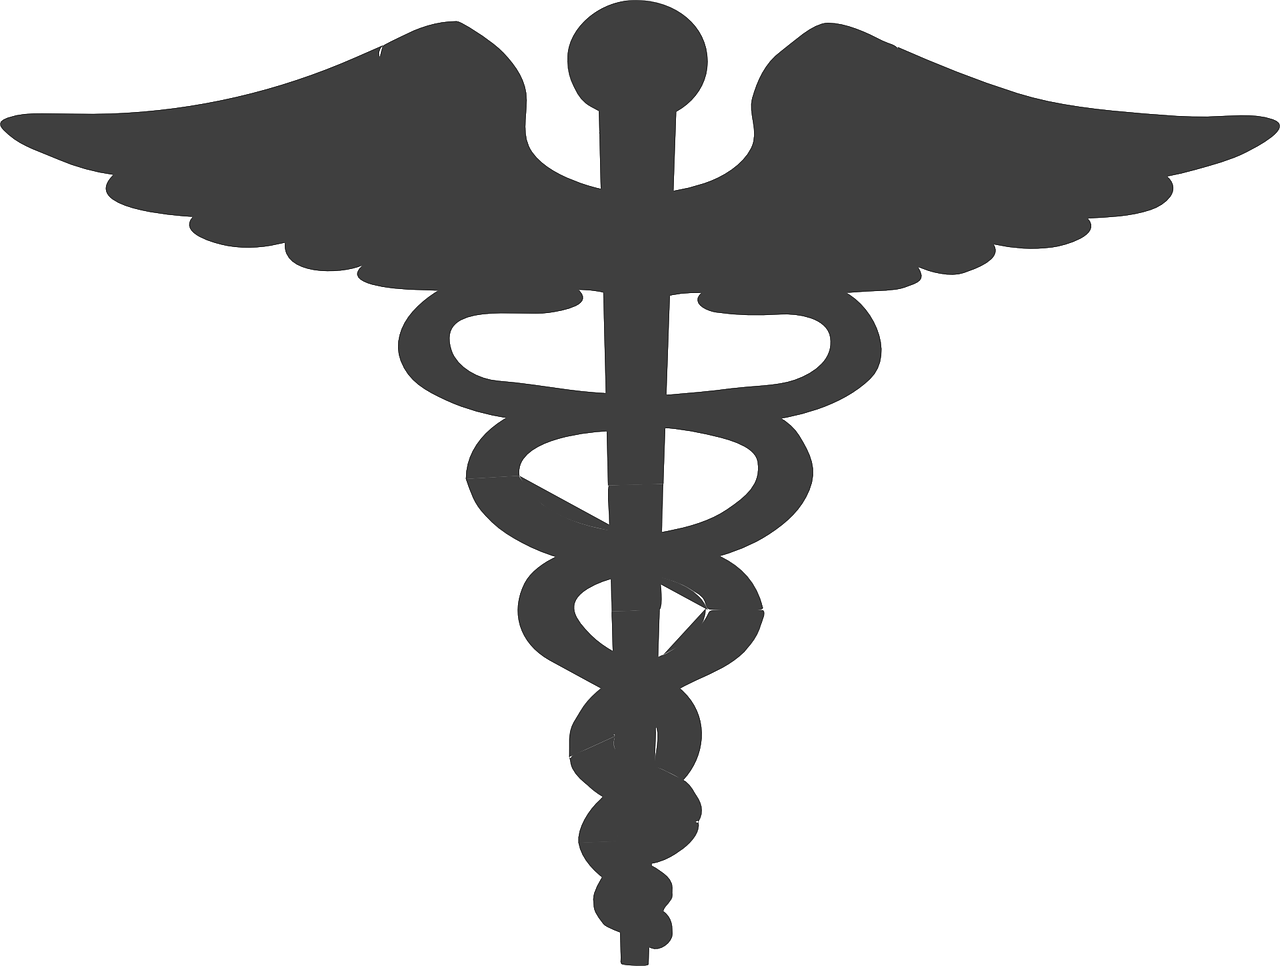 psych symbol.png